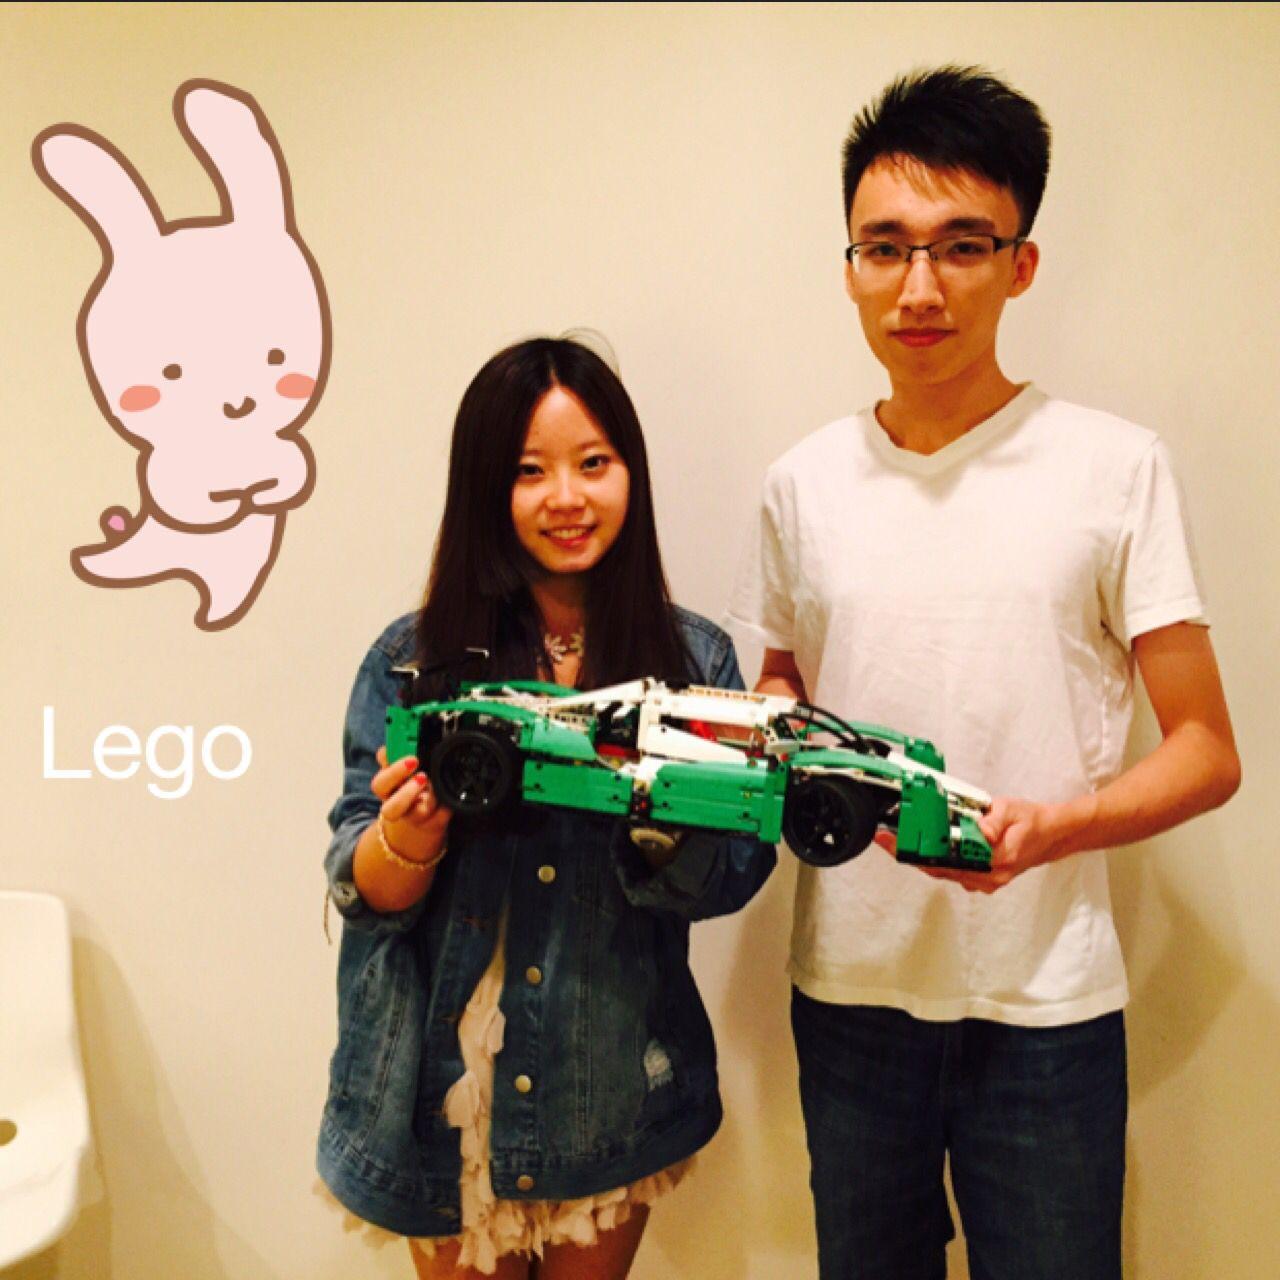 Lego technology